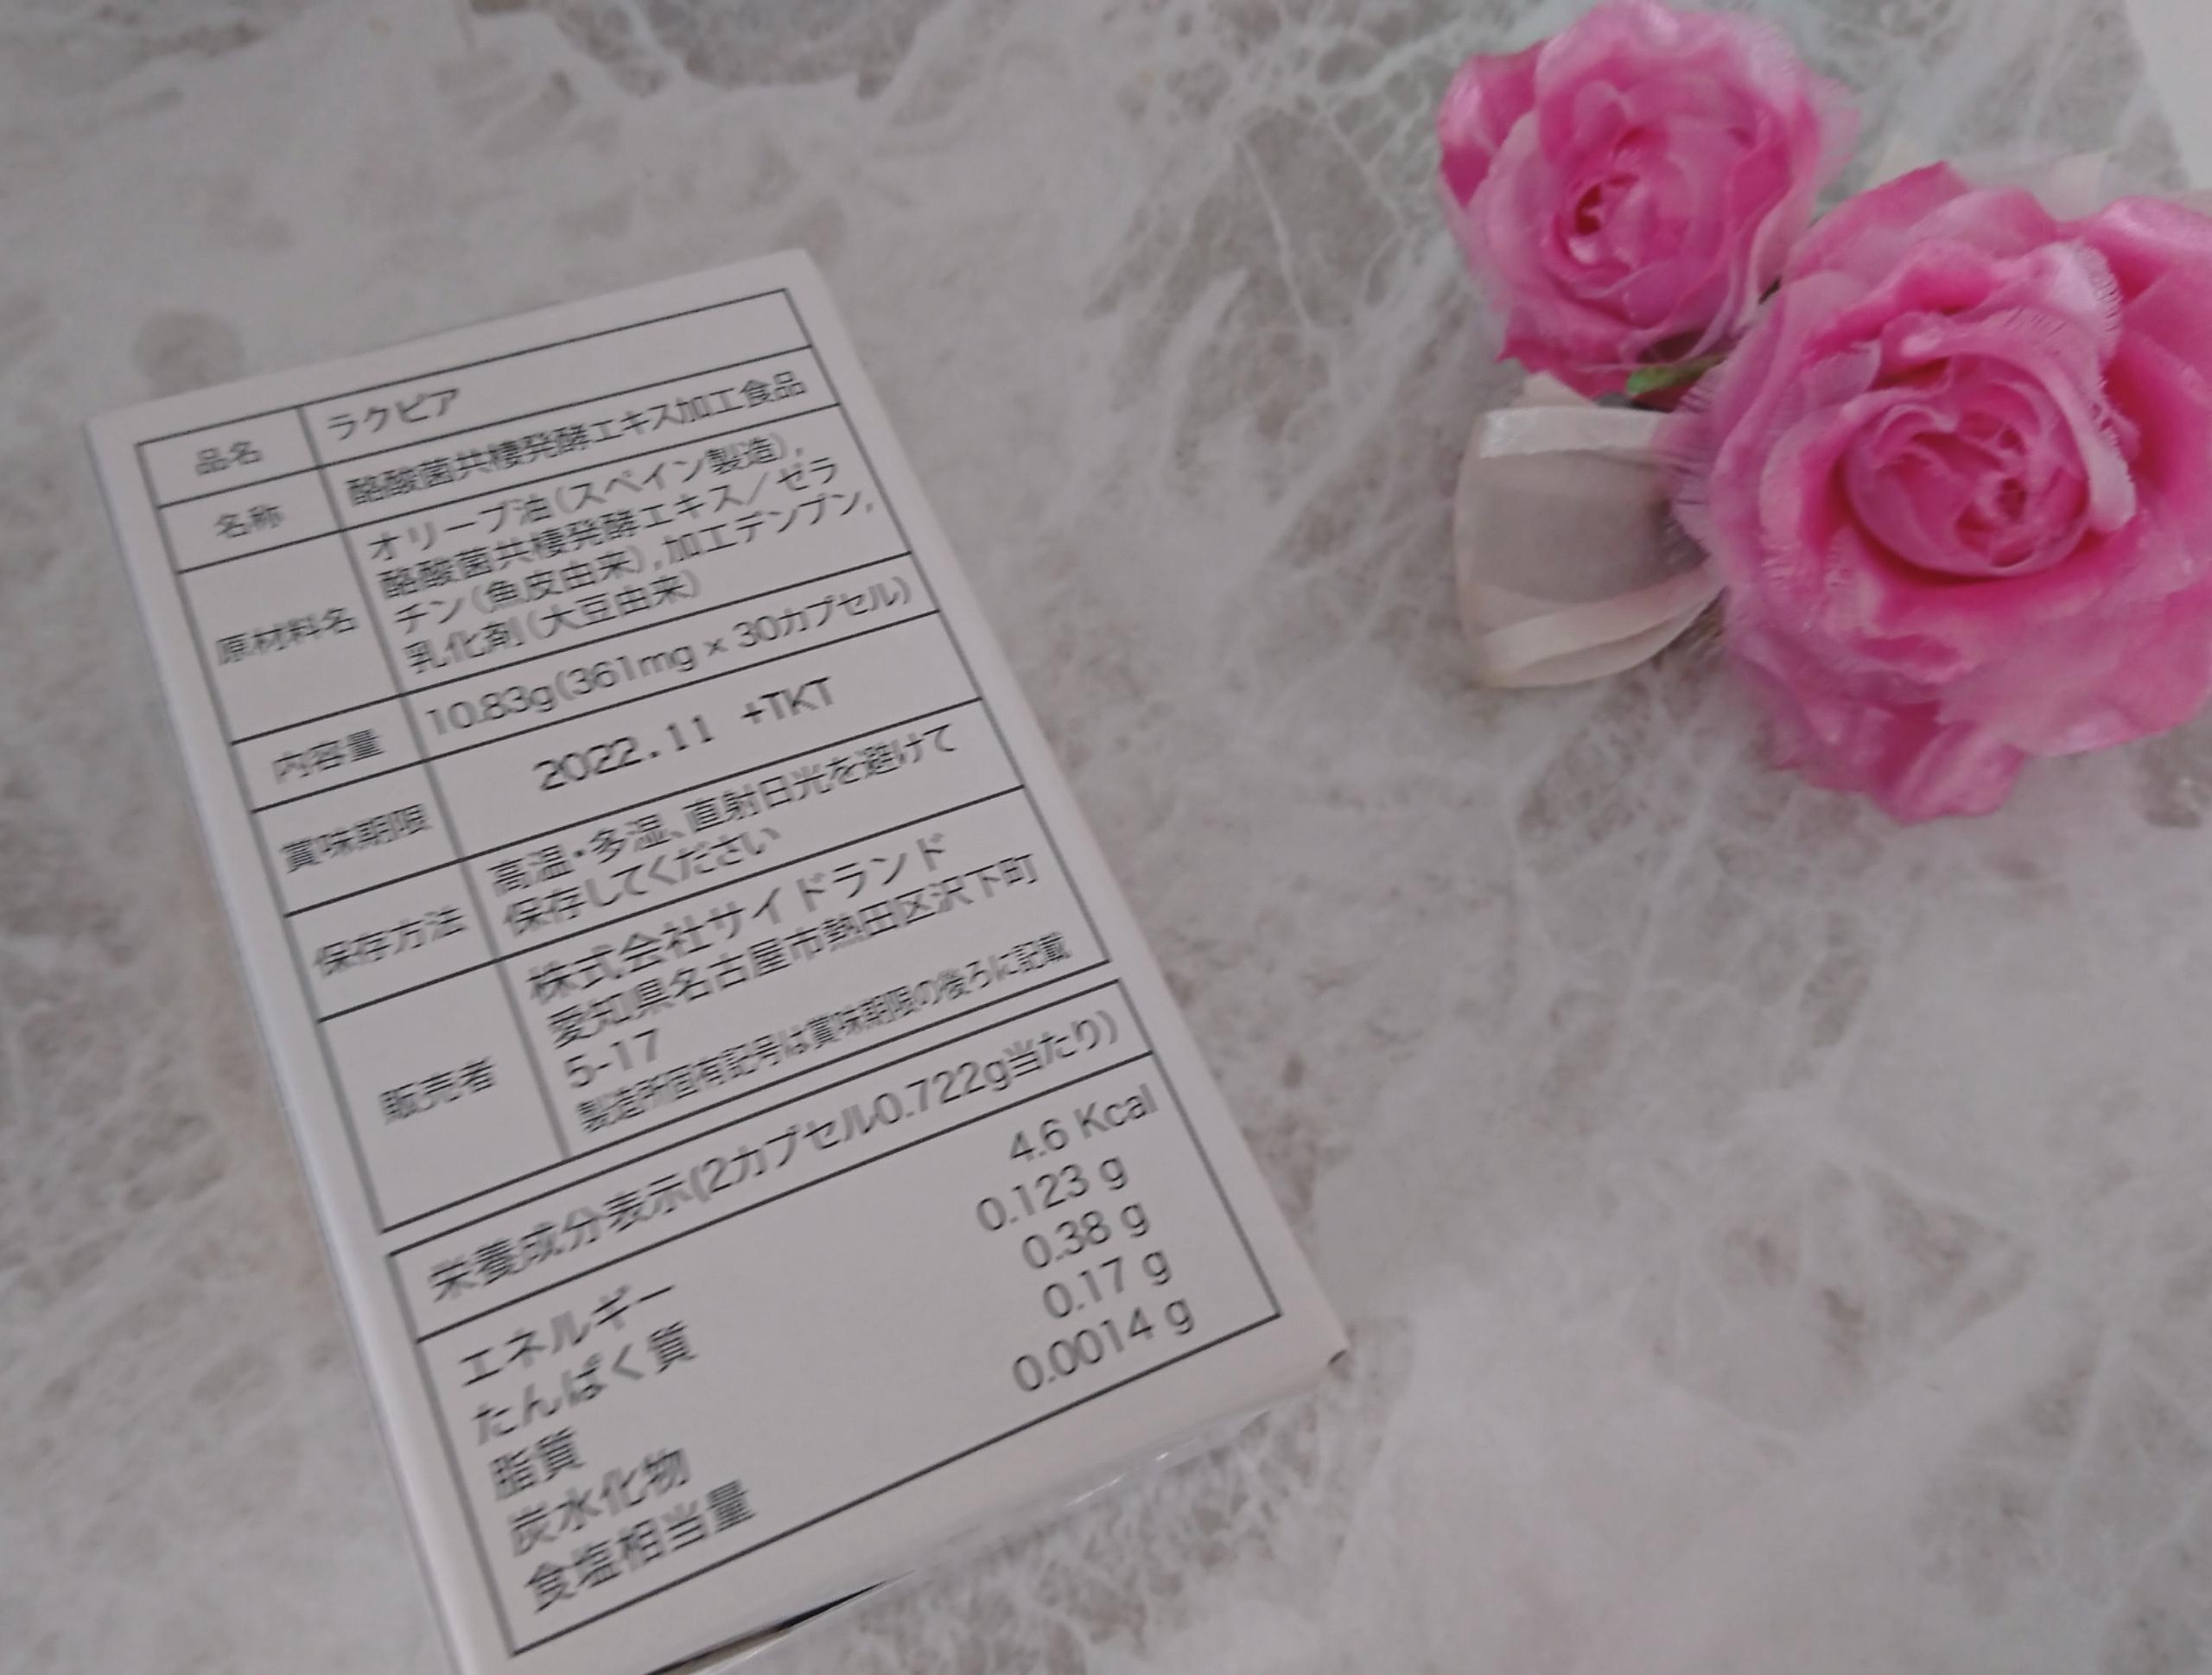 Lacpia(ラクピア) 短鎖脂肪酸サプリを使ったYuKaRi♡さんのクチコミ画像2